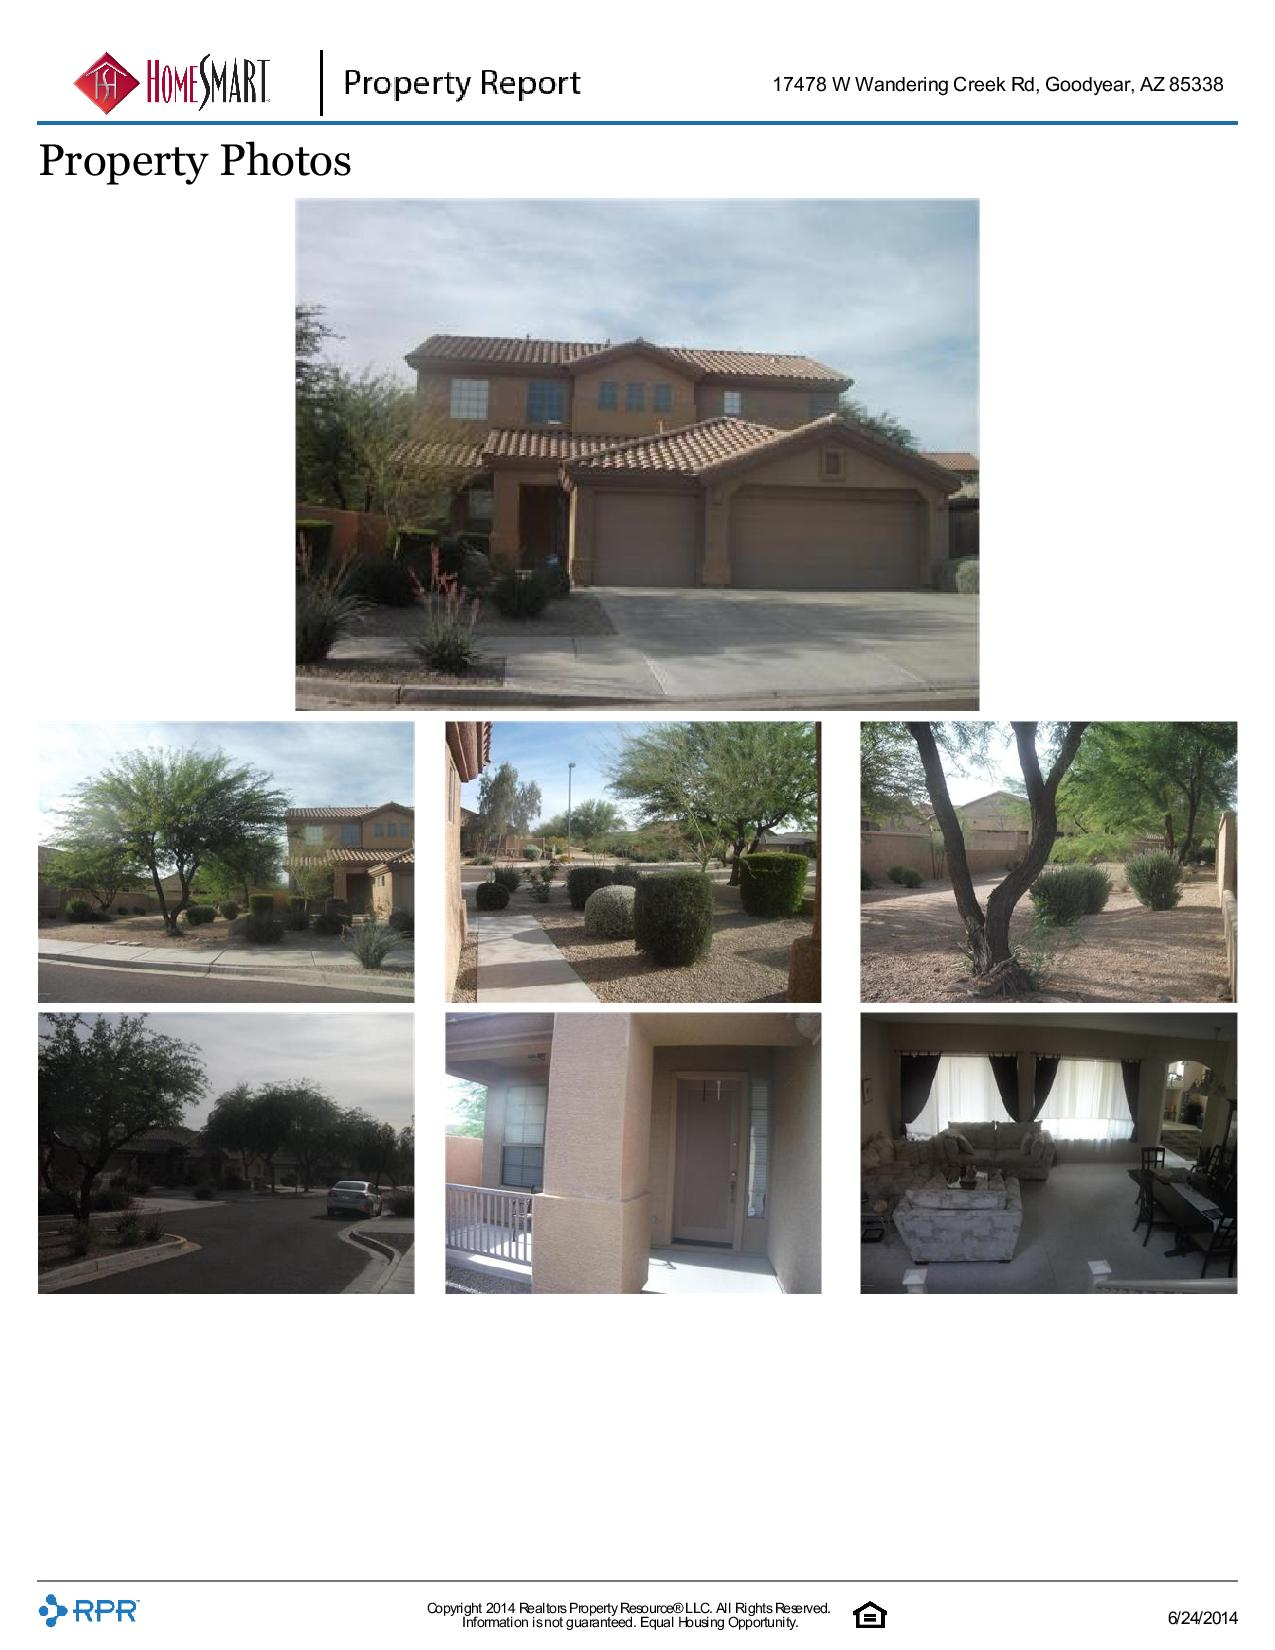 17478-W-Wandering-Creek-Rd-Goodyear-AZ-85338-page-005